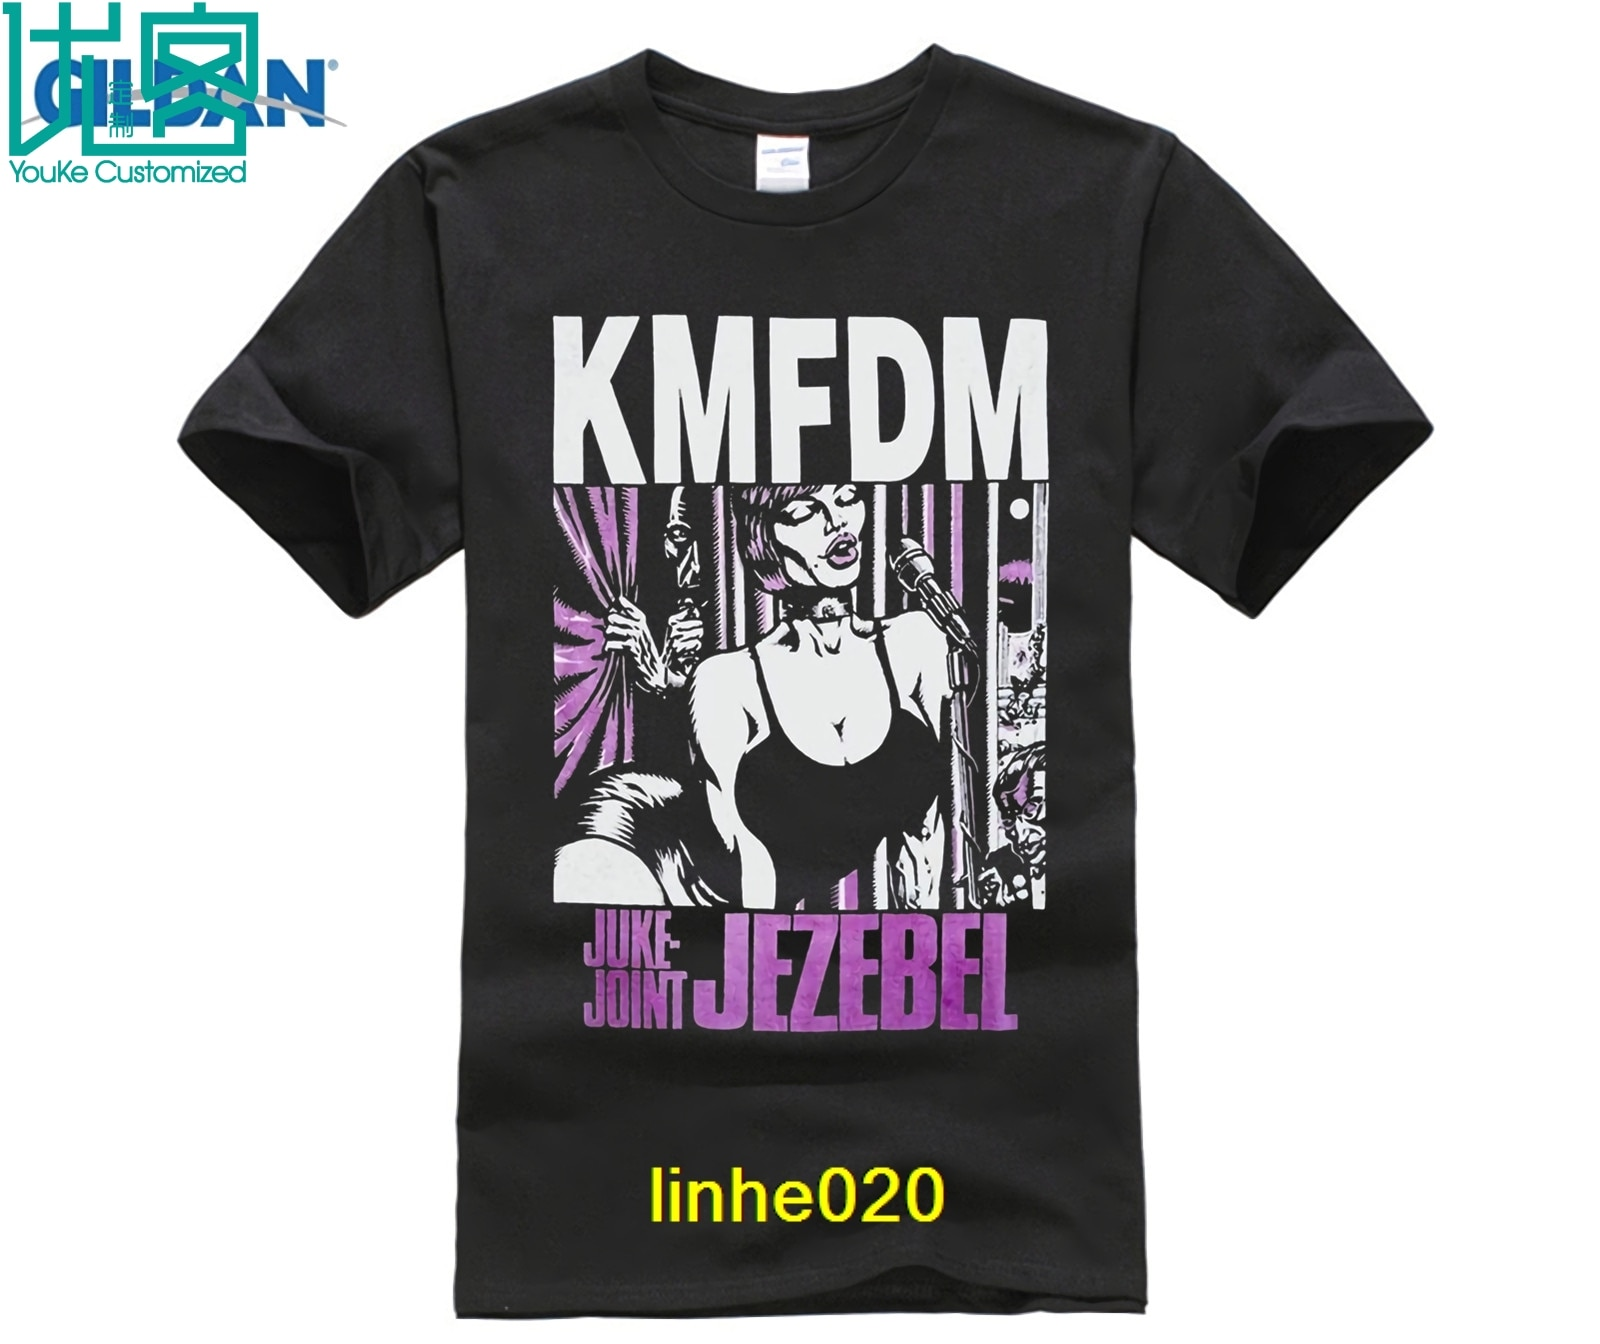 Kmfdm Juke Joint Jezebel Kraut Industrial Pigface Mdmfk nueva camiseta negra nueva marca-Ropa Camisetas Top Tee